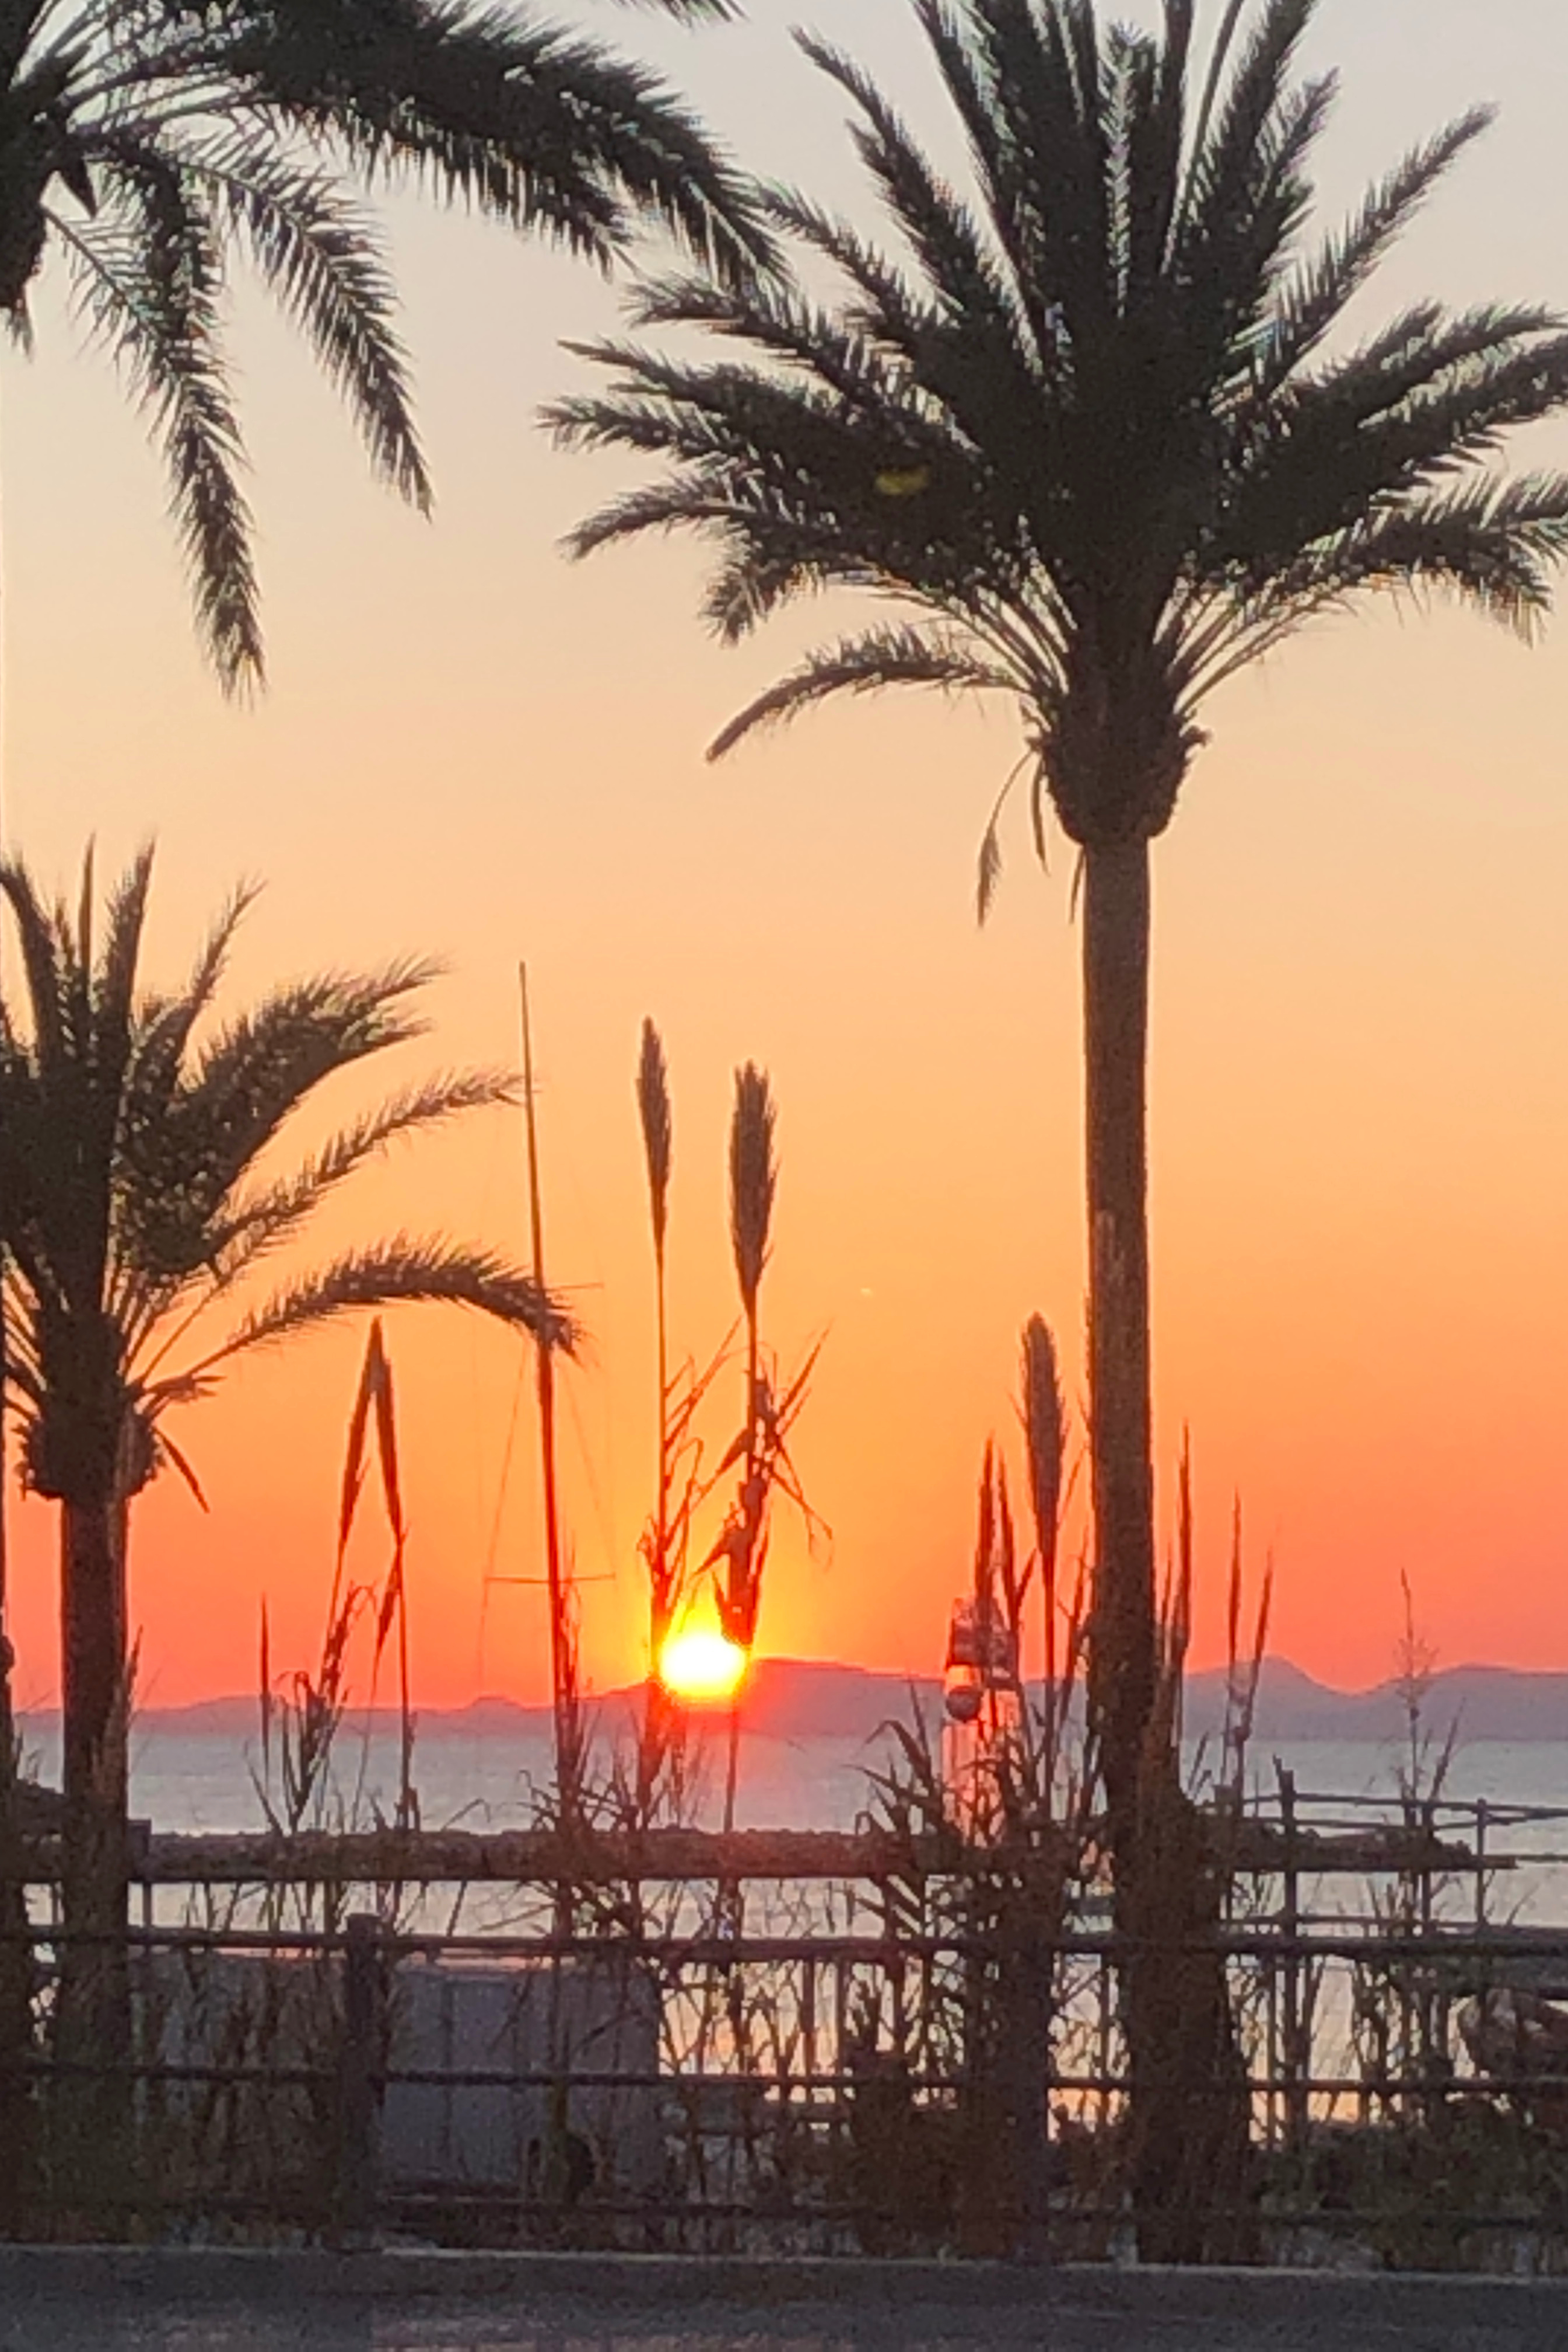 The evening sunset at Oranje Buiten rest